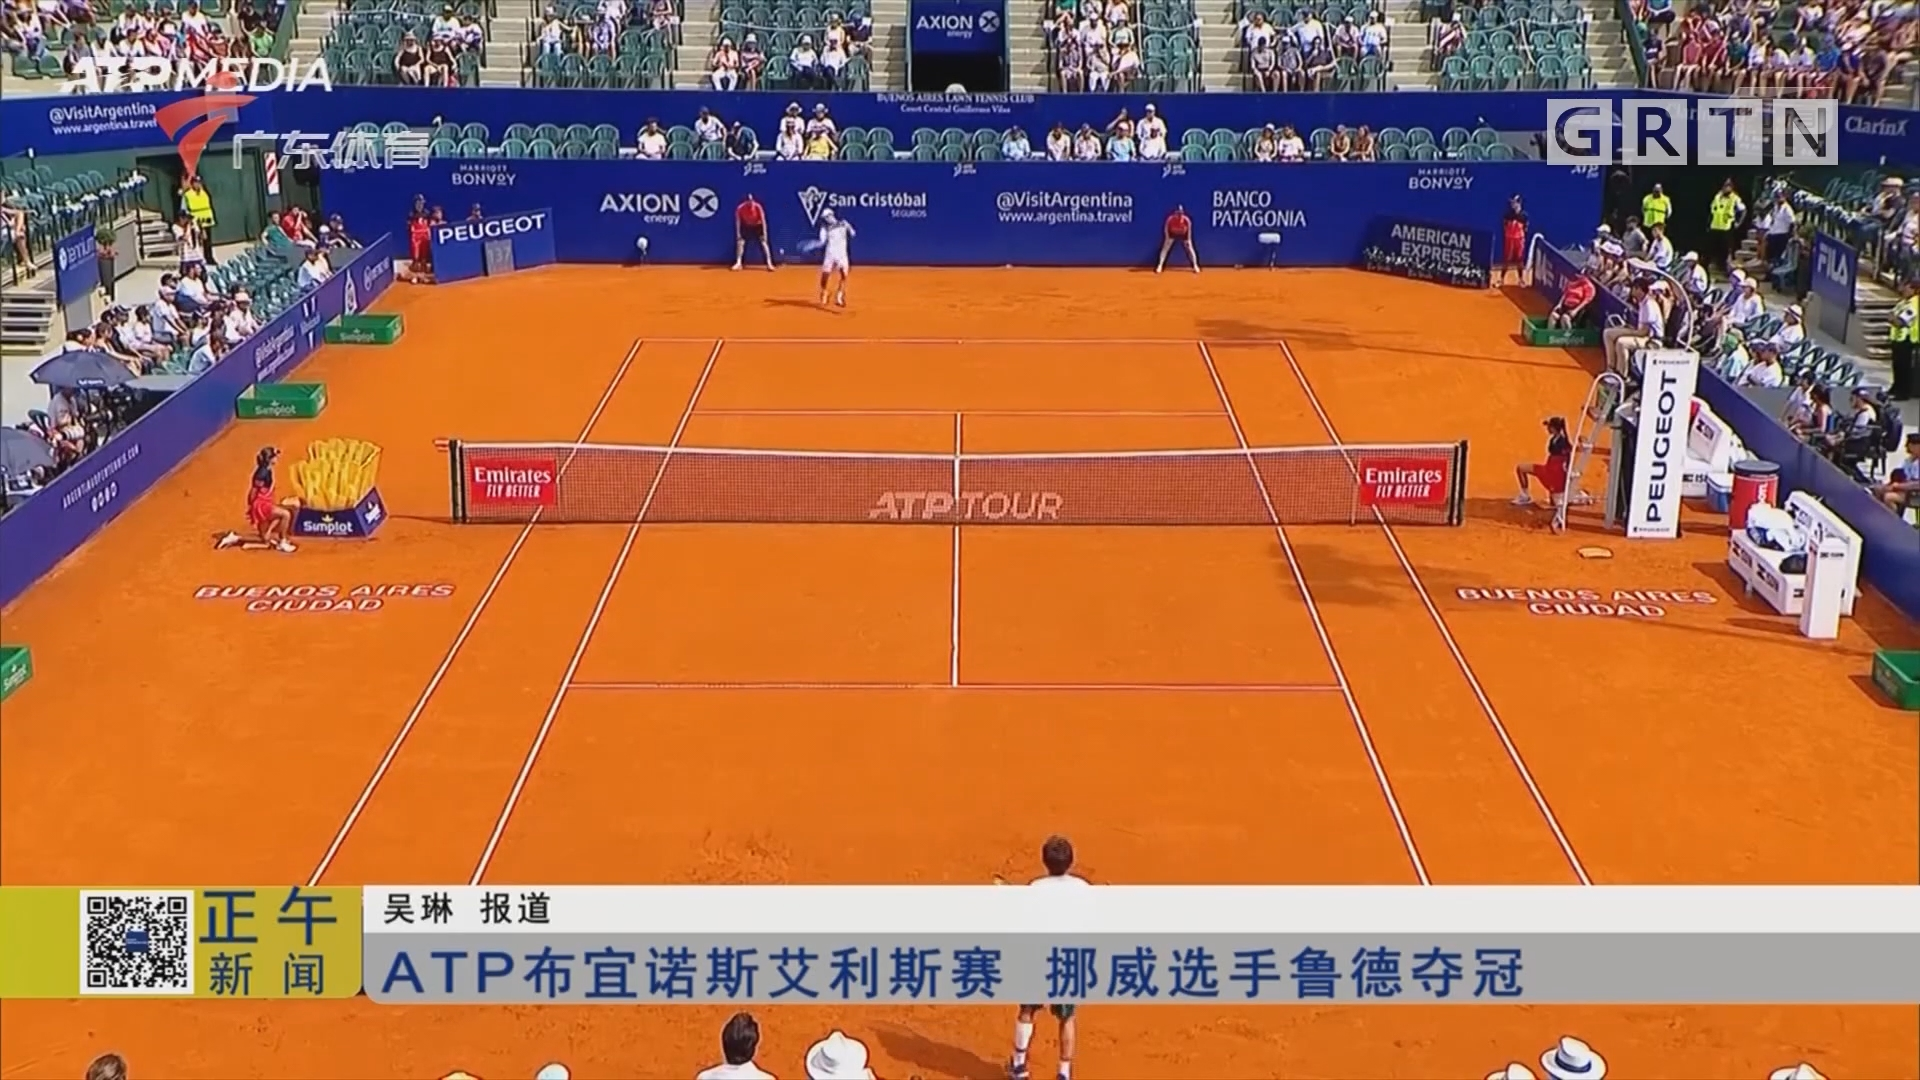 ATP布宜诺斯艾利斯赛 挪威选手鲁德夺冠